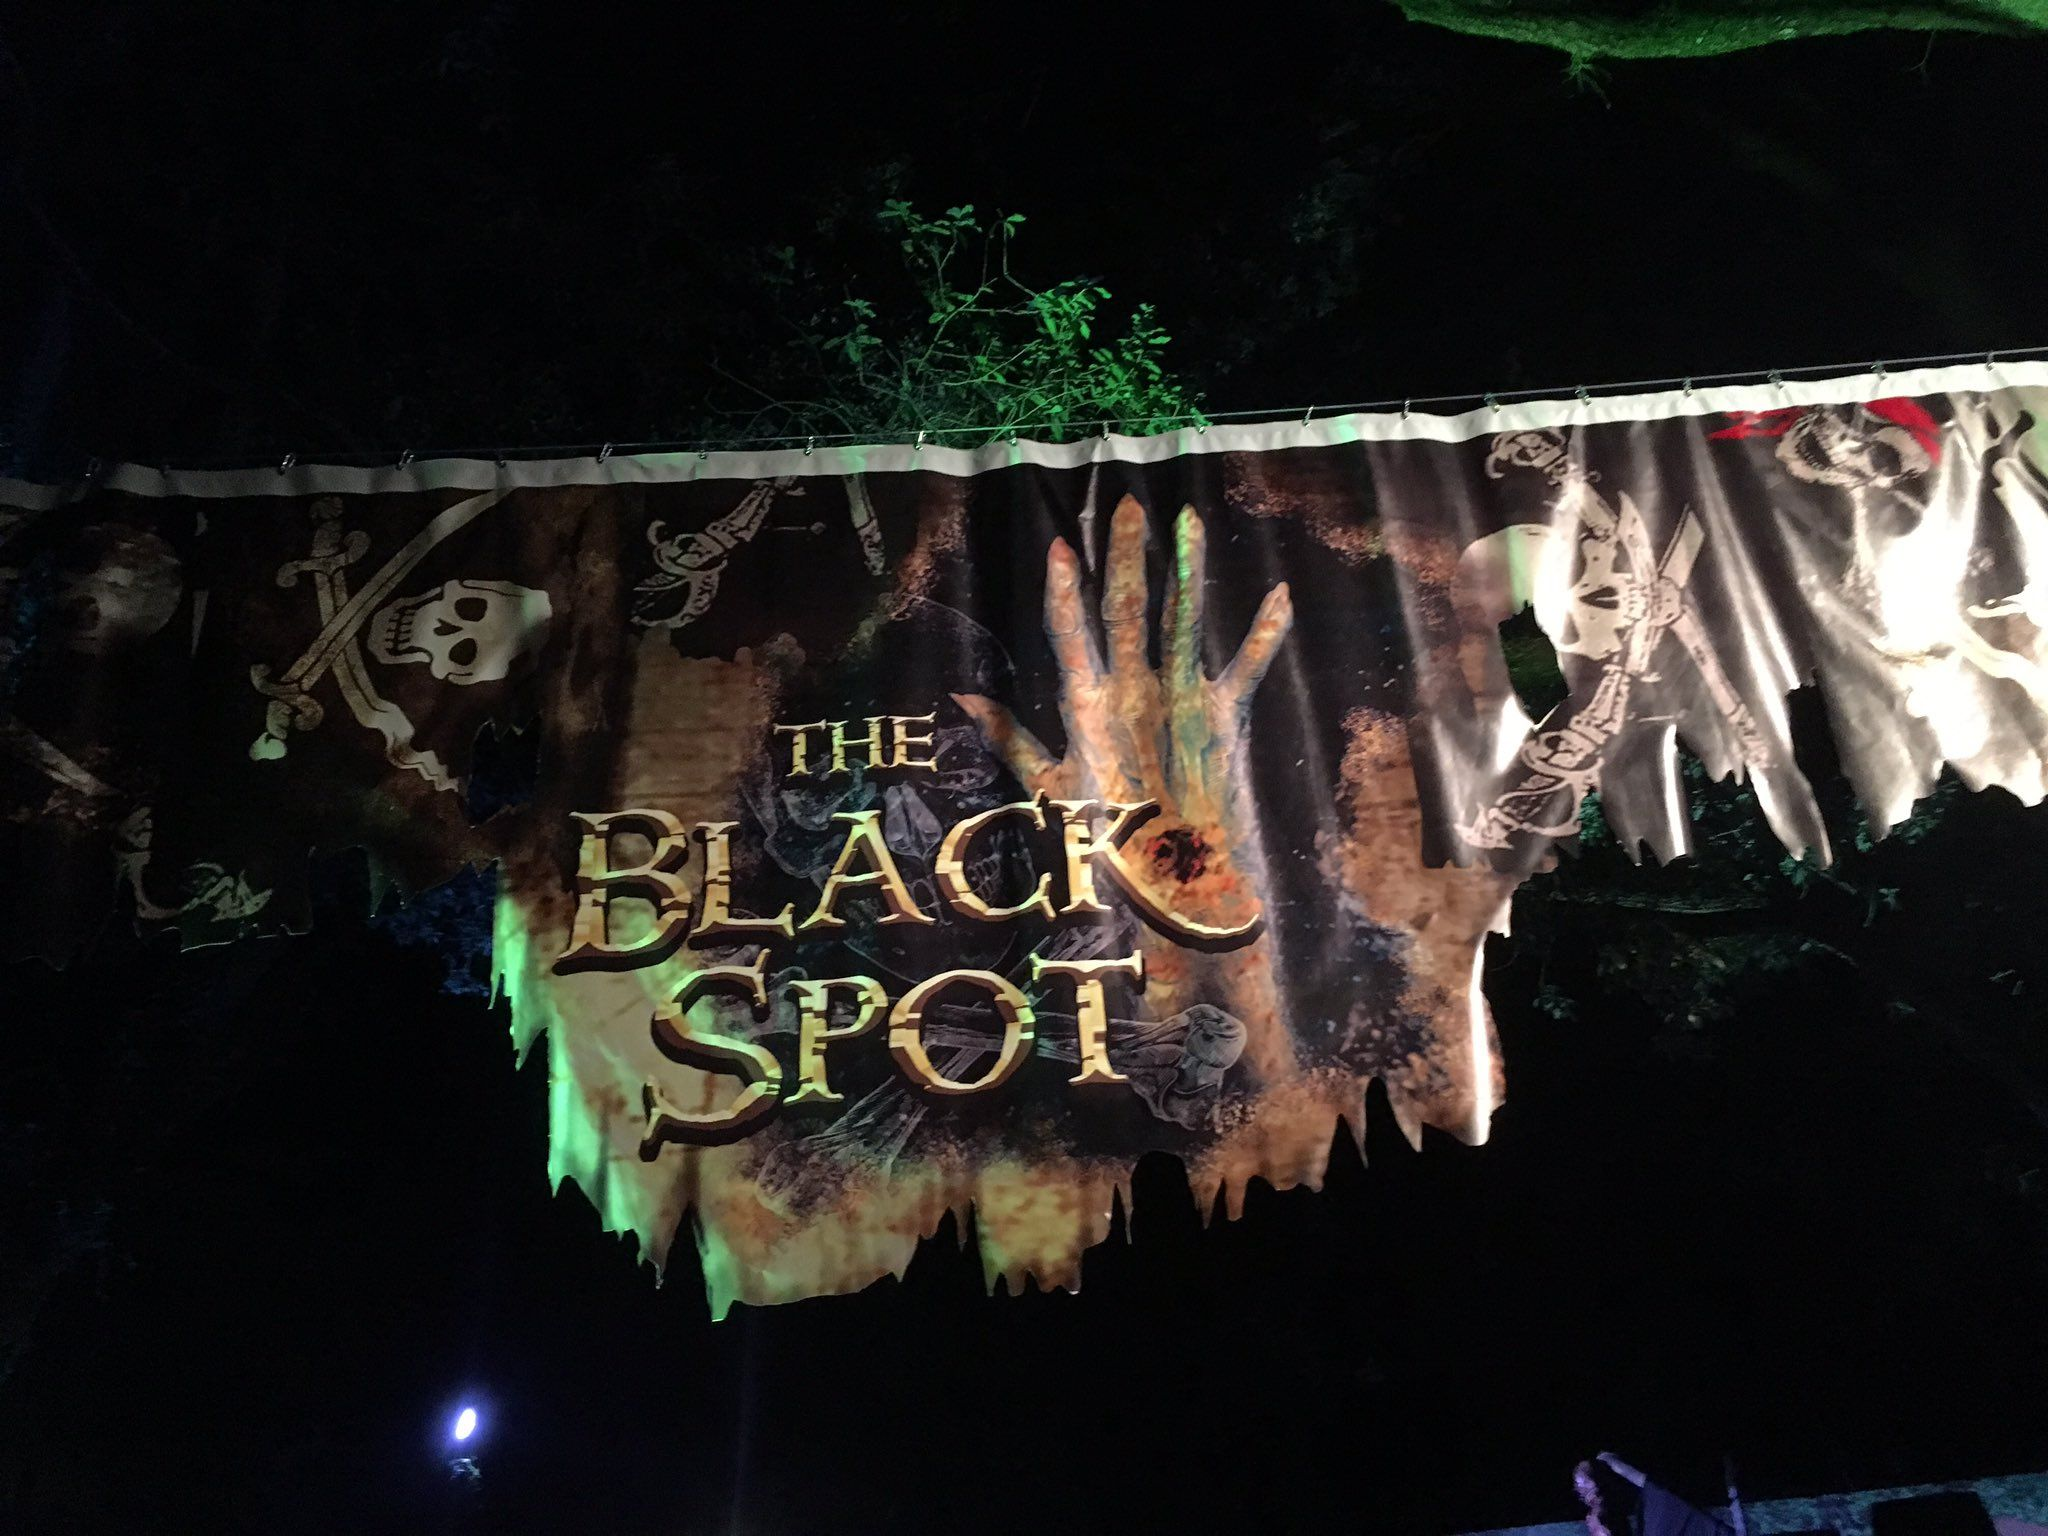 The Black Spot pirate themed haunted house looked great! Lots of fun! @BuschGardens @howloscream #HowlOScream https://t.co/V4eaNdiRa4